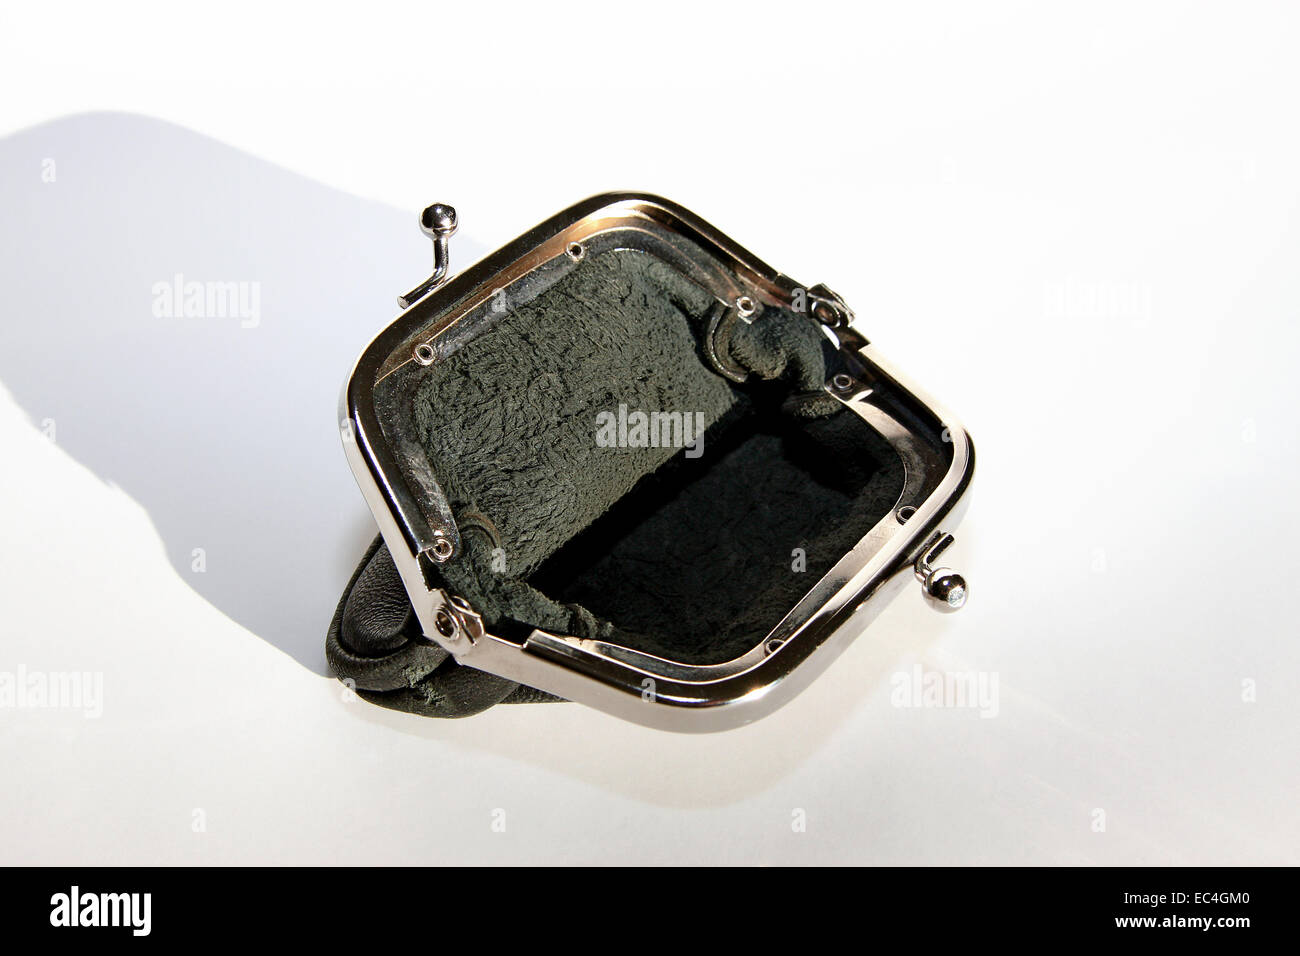 money purse - Stock Image